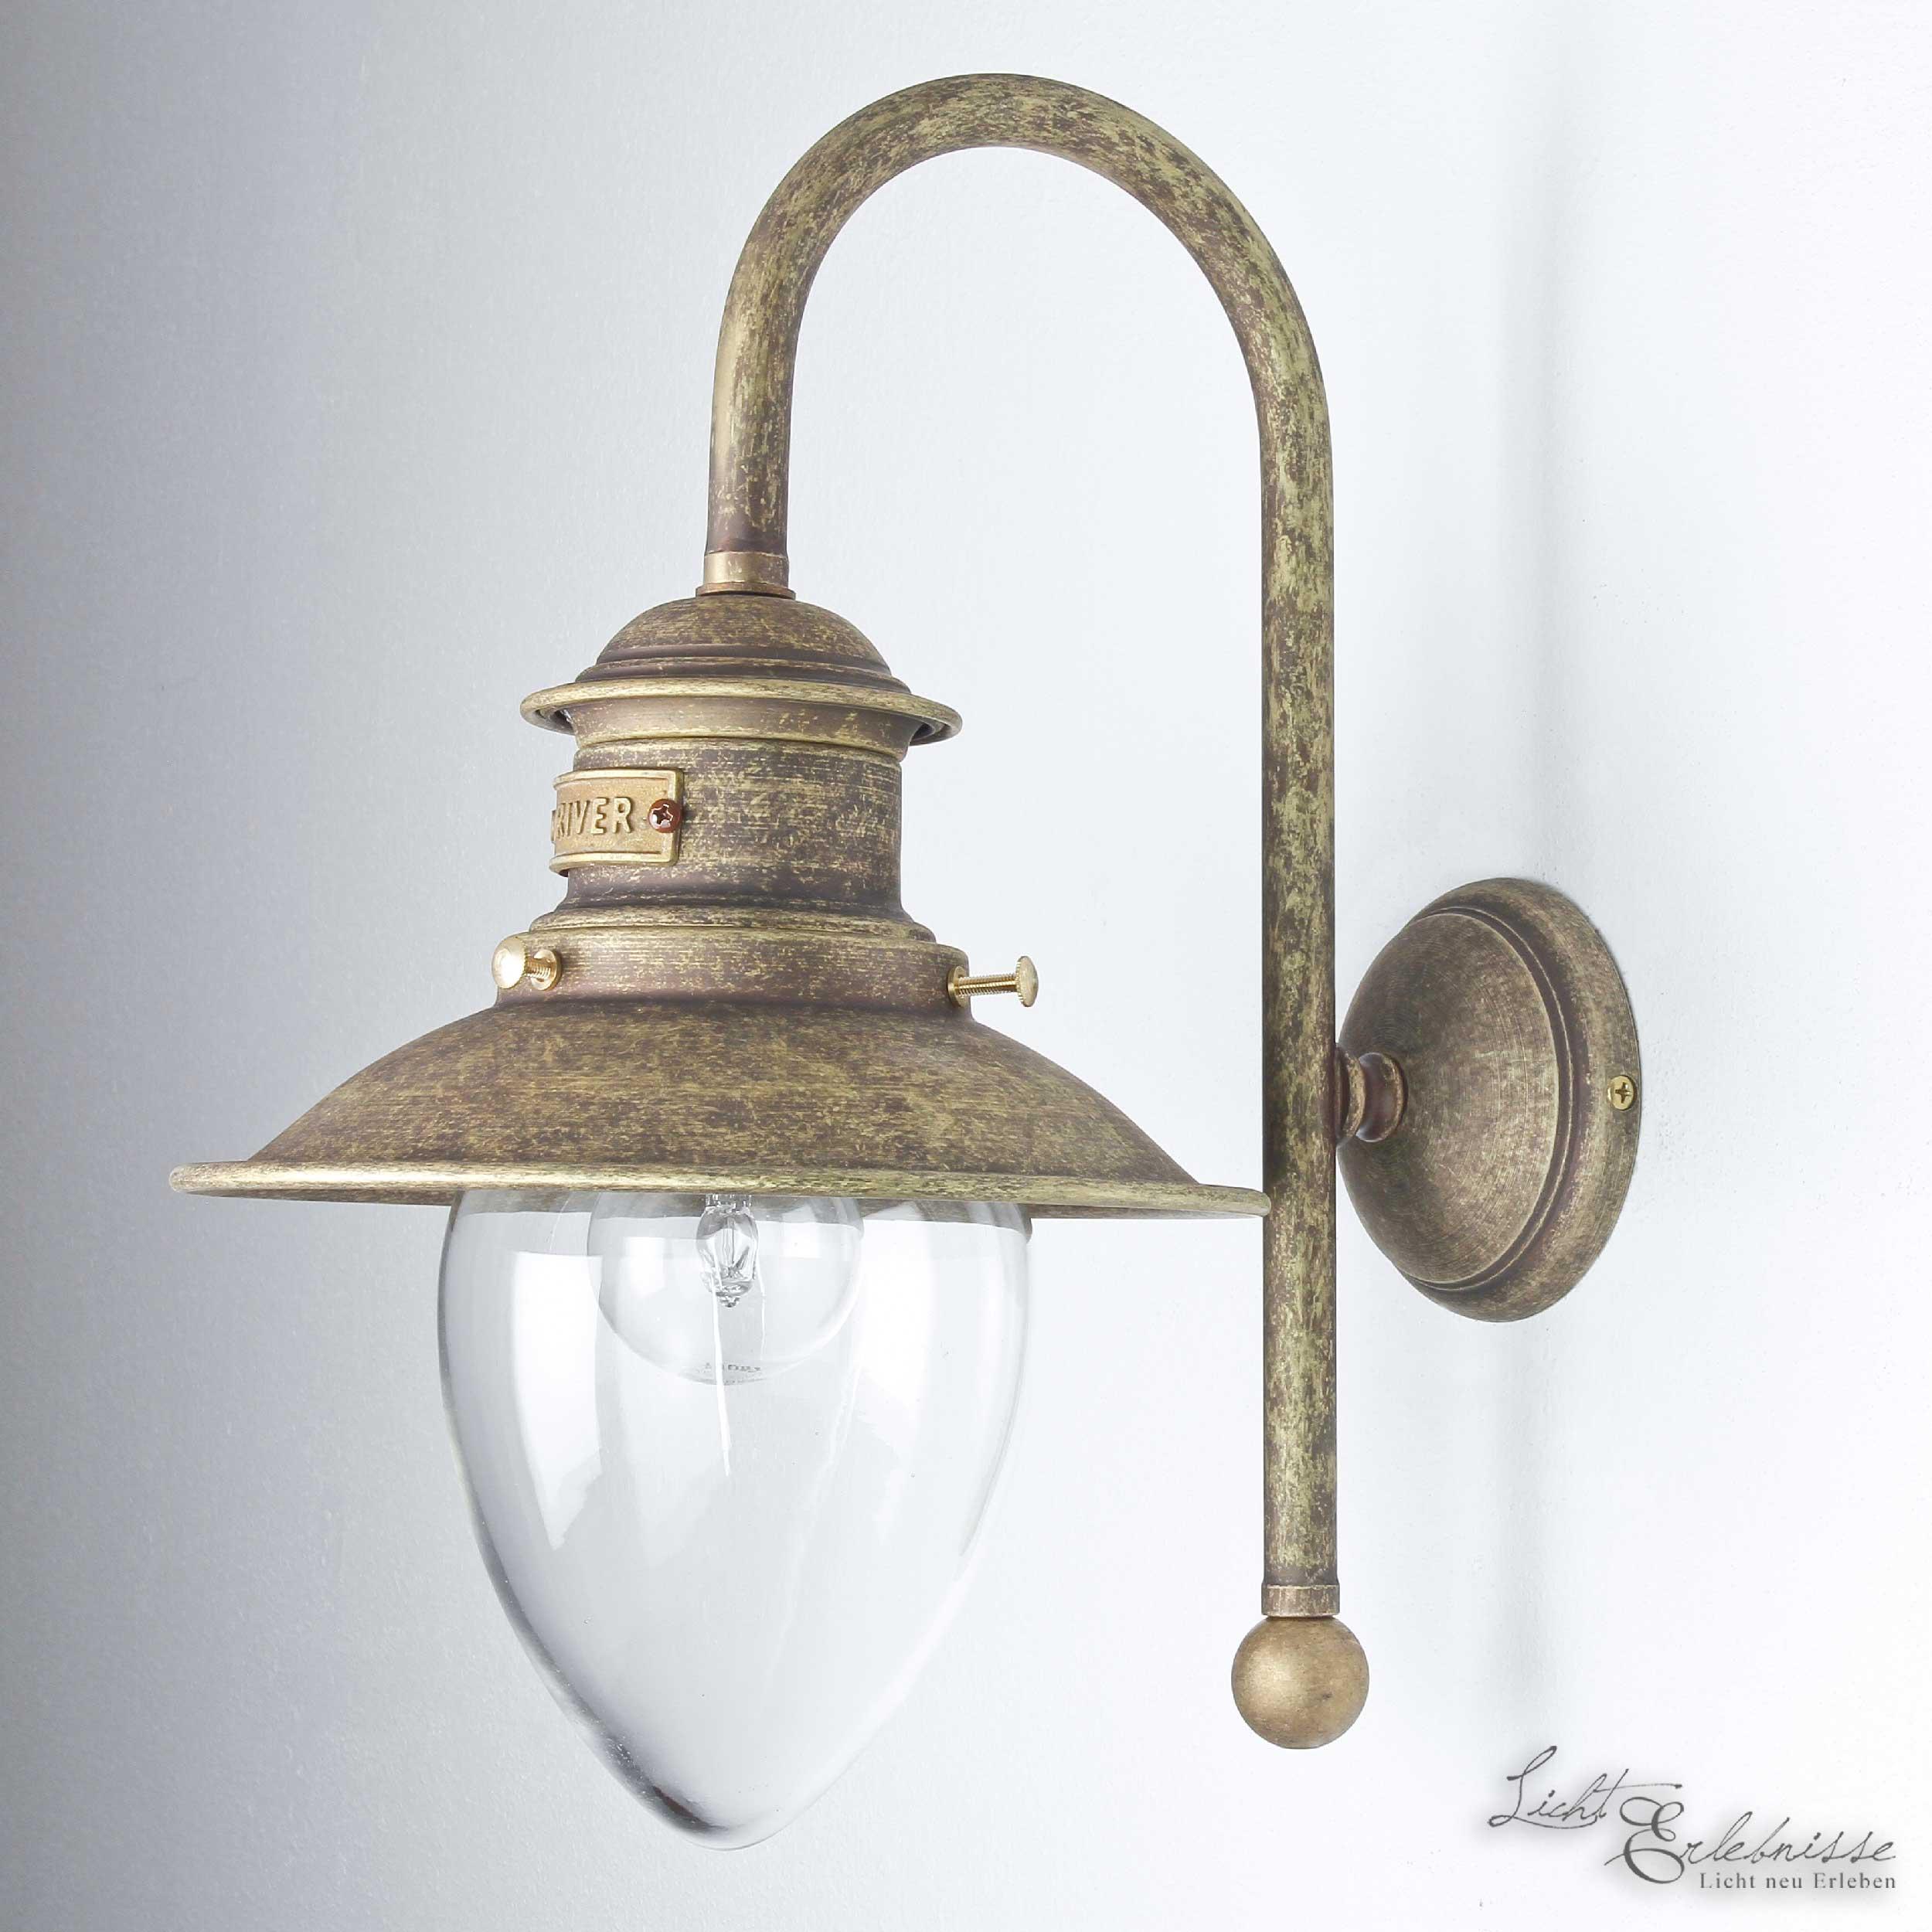 Außen Wandleuchte Lampe Echt-Messing Bronziert IP44 E27 Glas Maritim Handarbeit